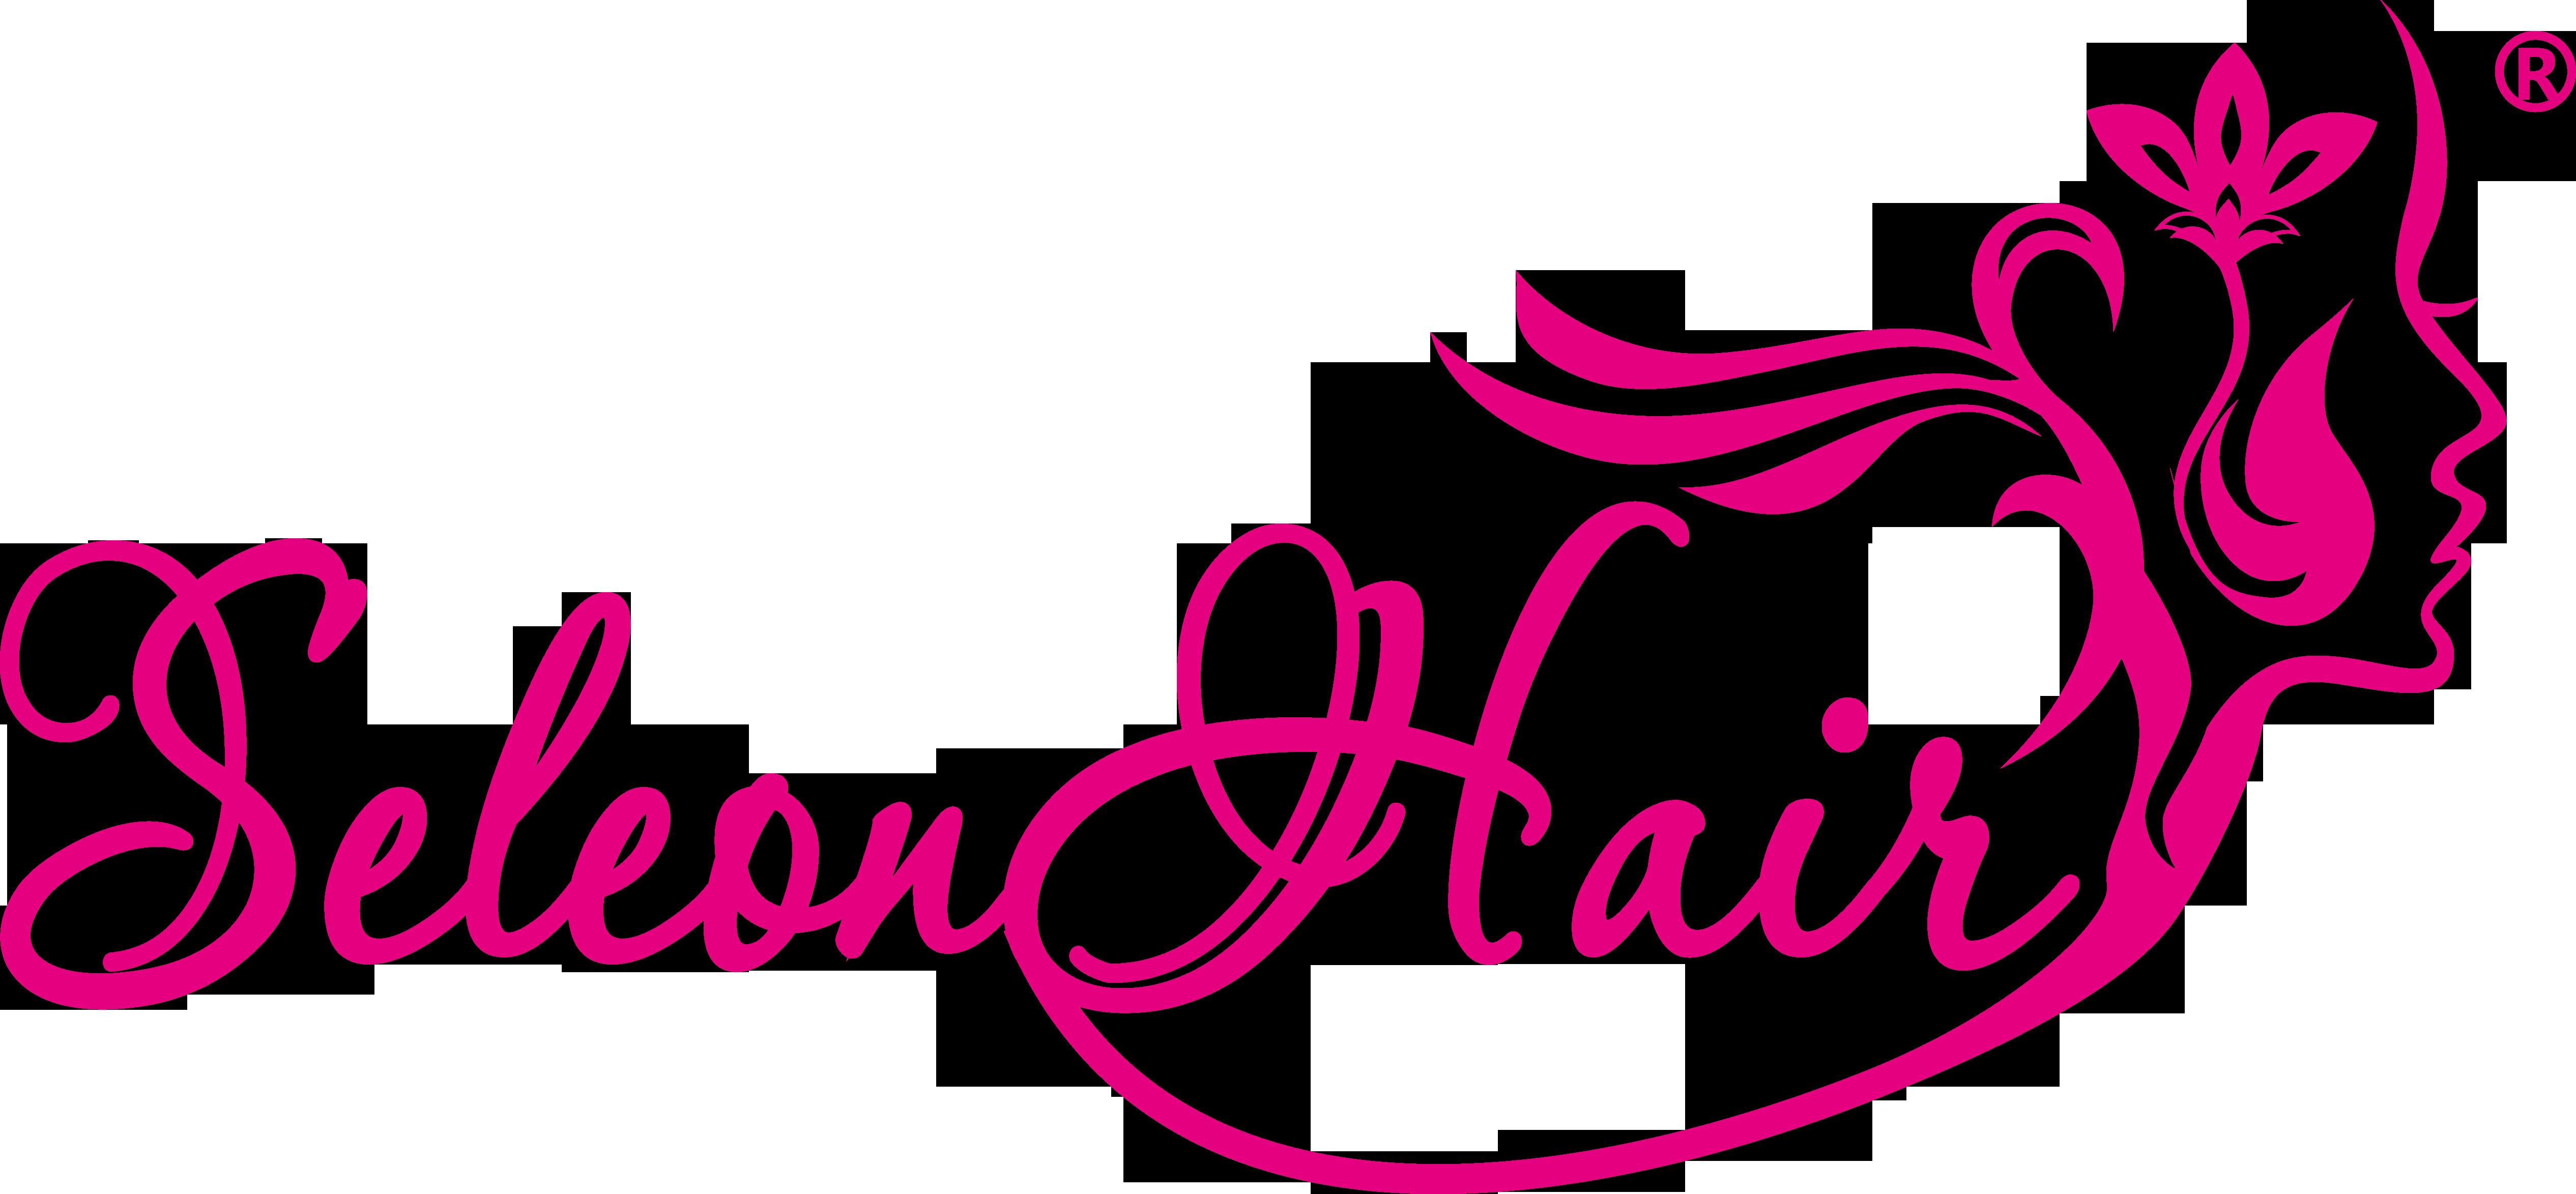 SeleonHair Official Human Hair Website